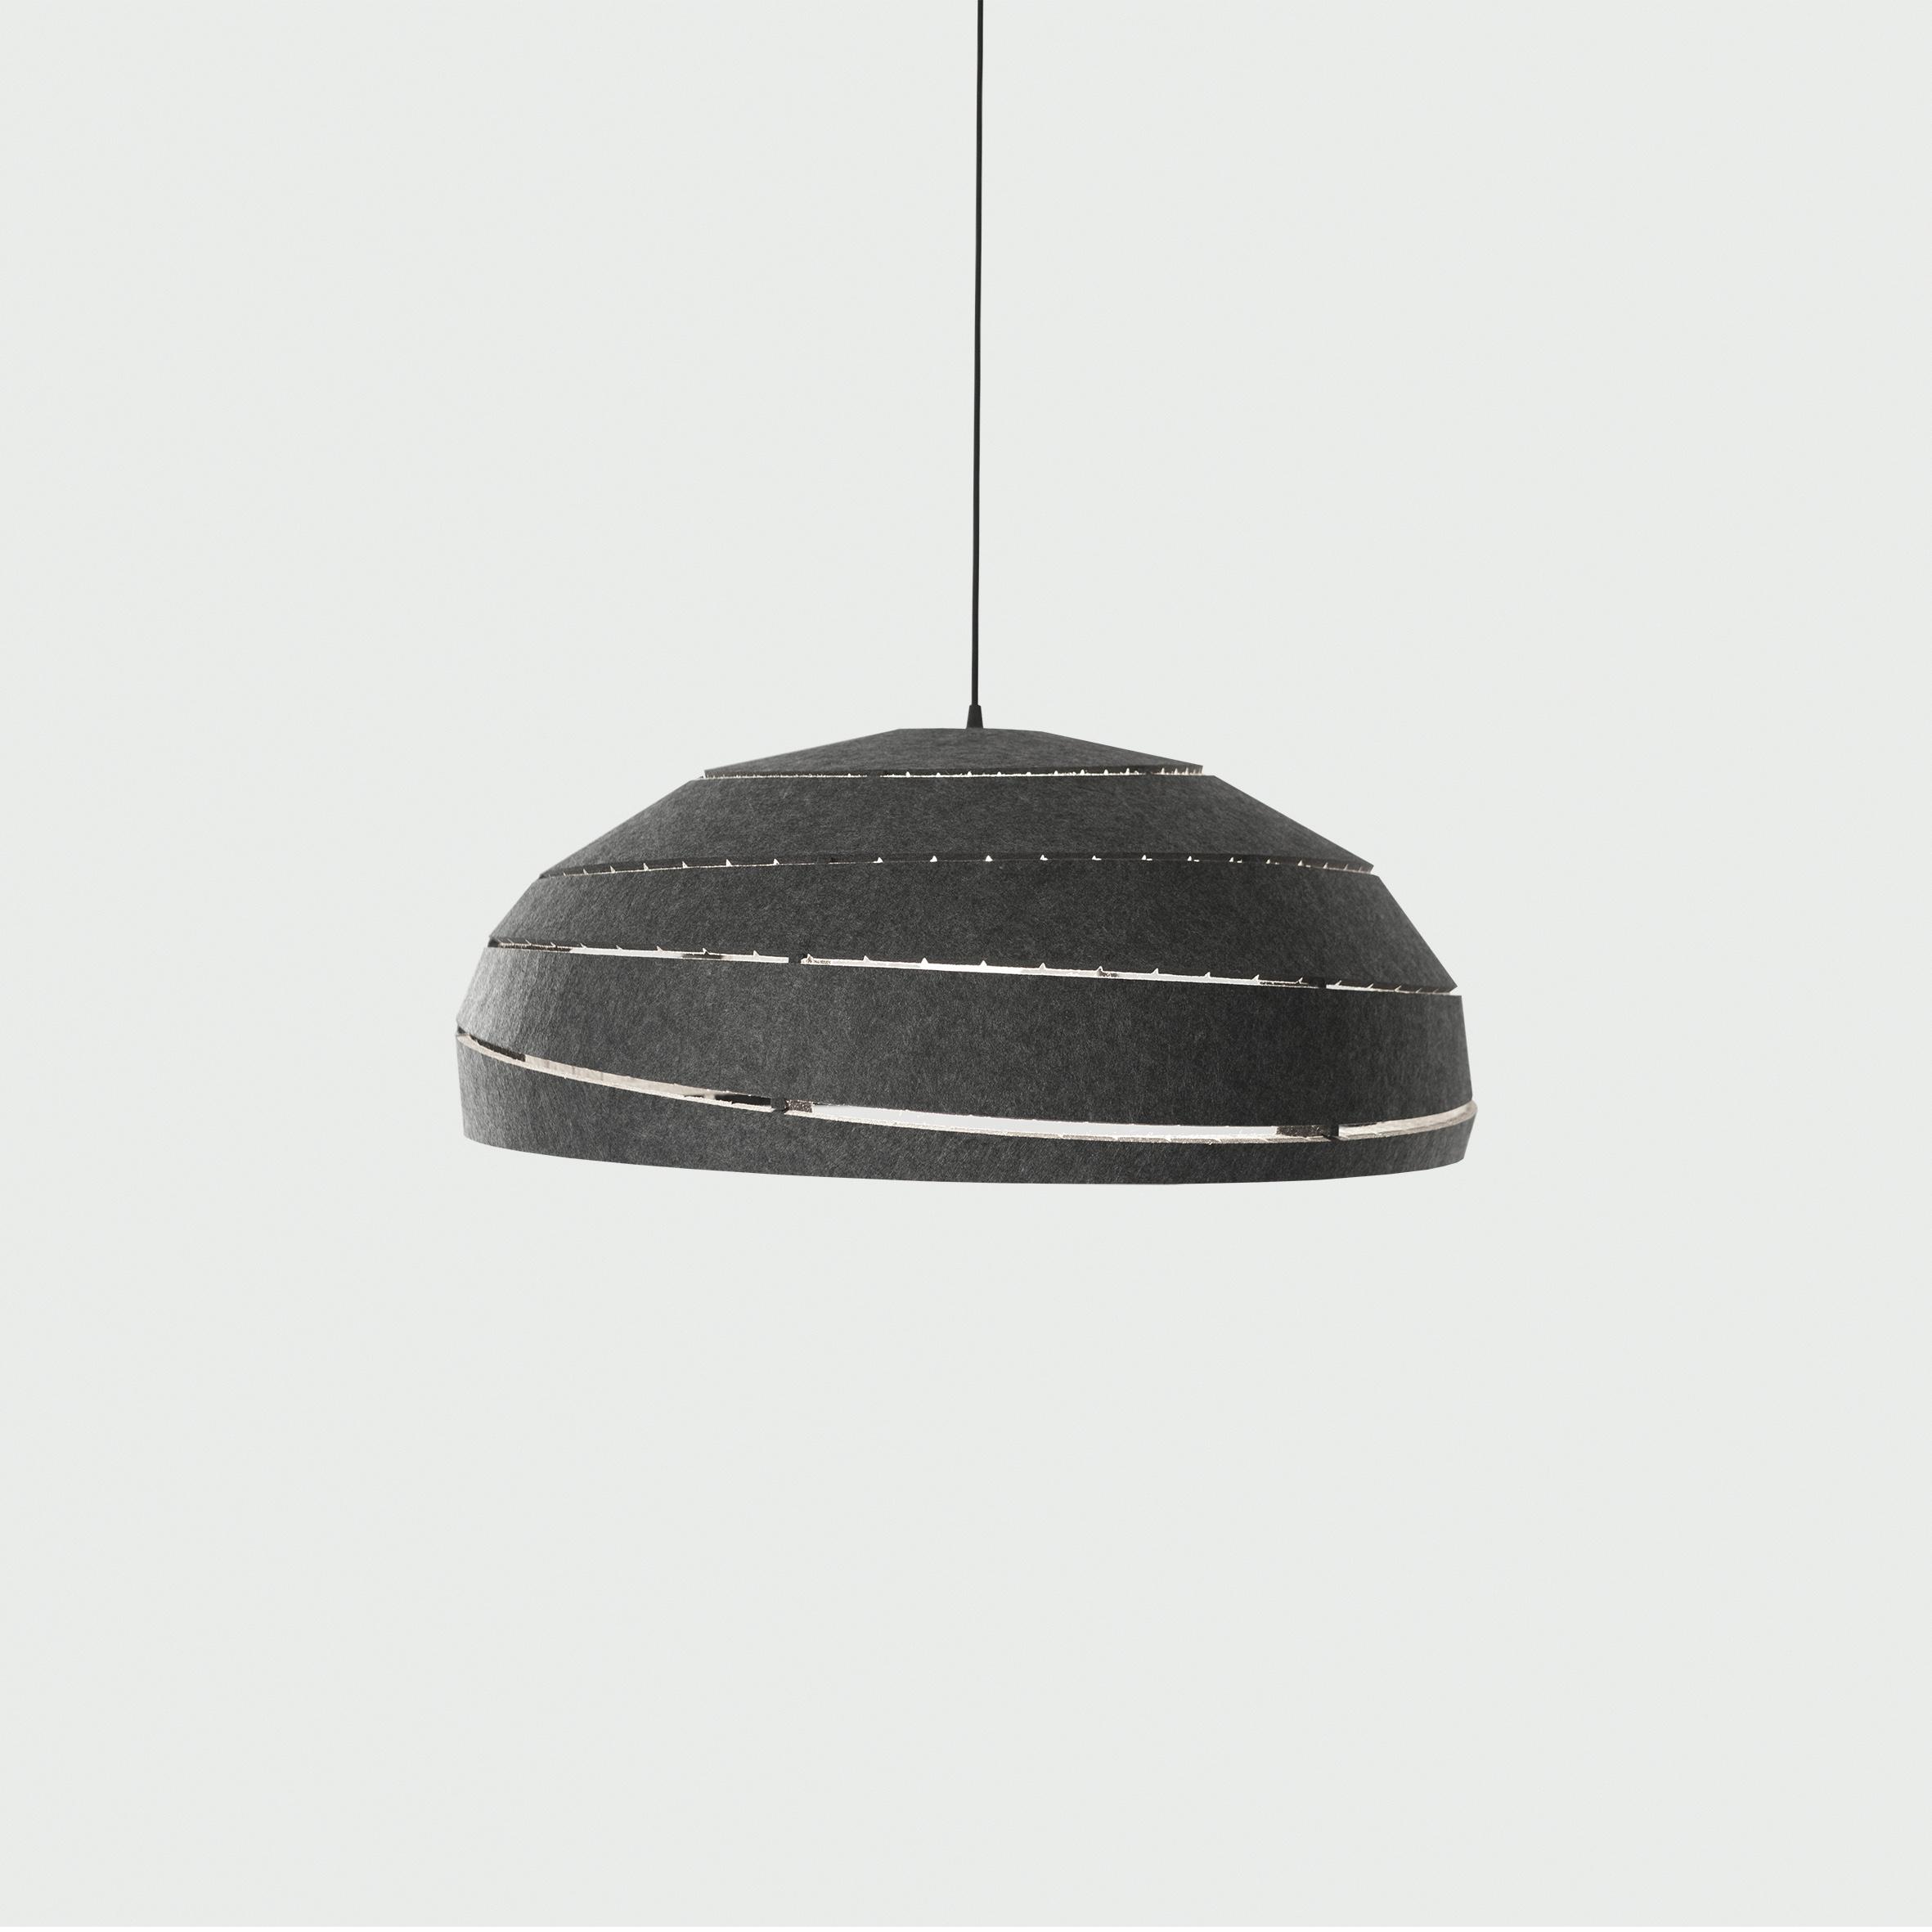 Sliced PET Felt lamp